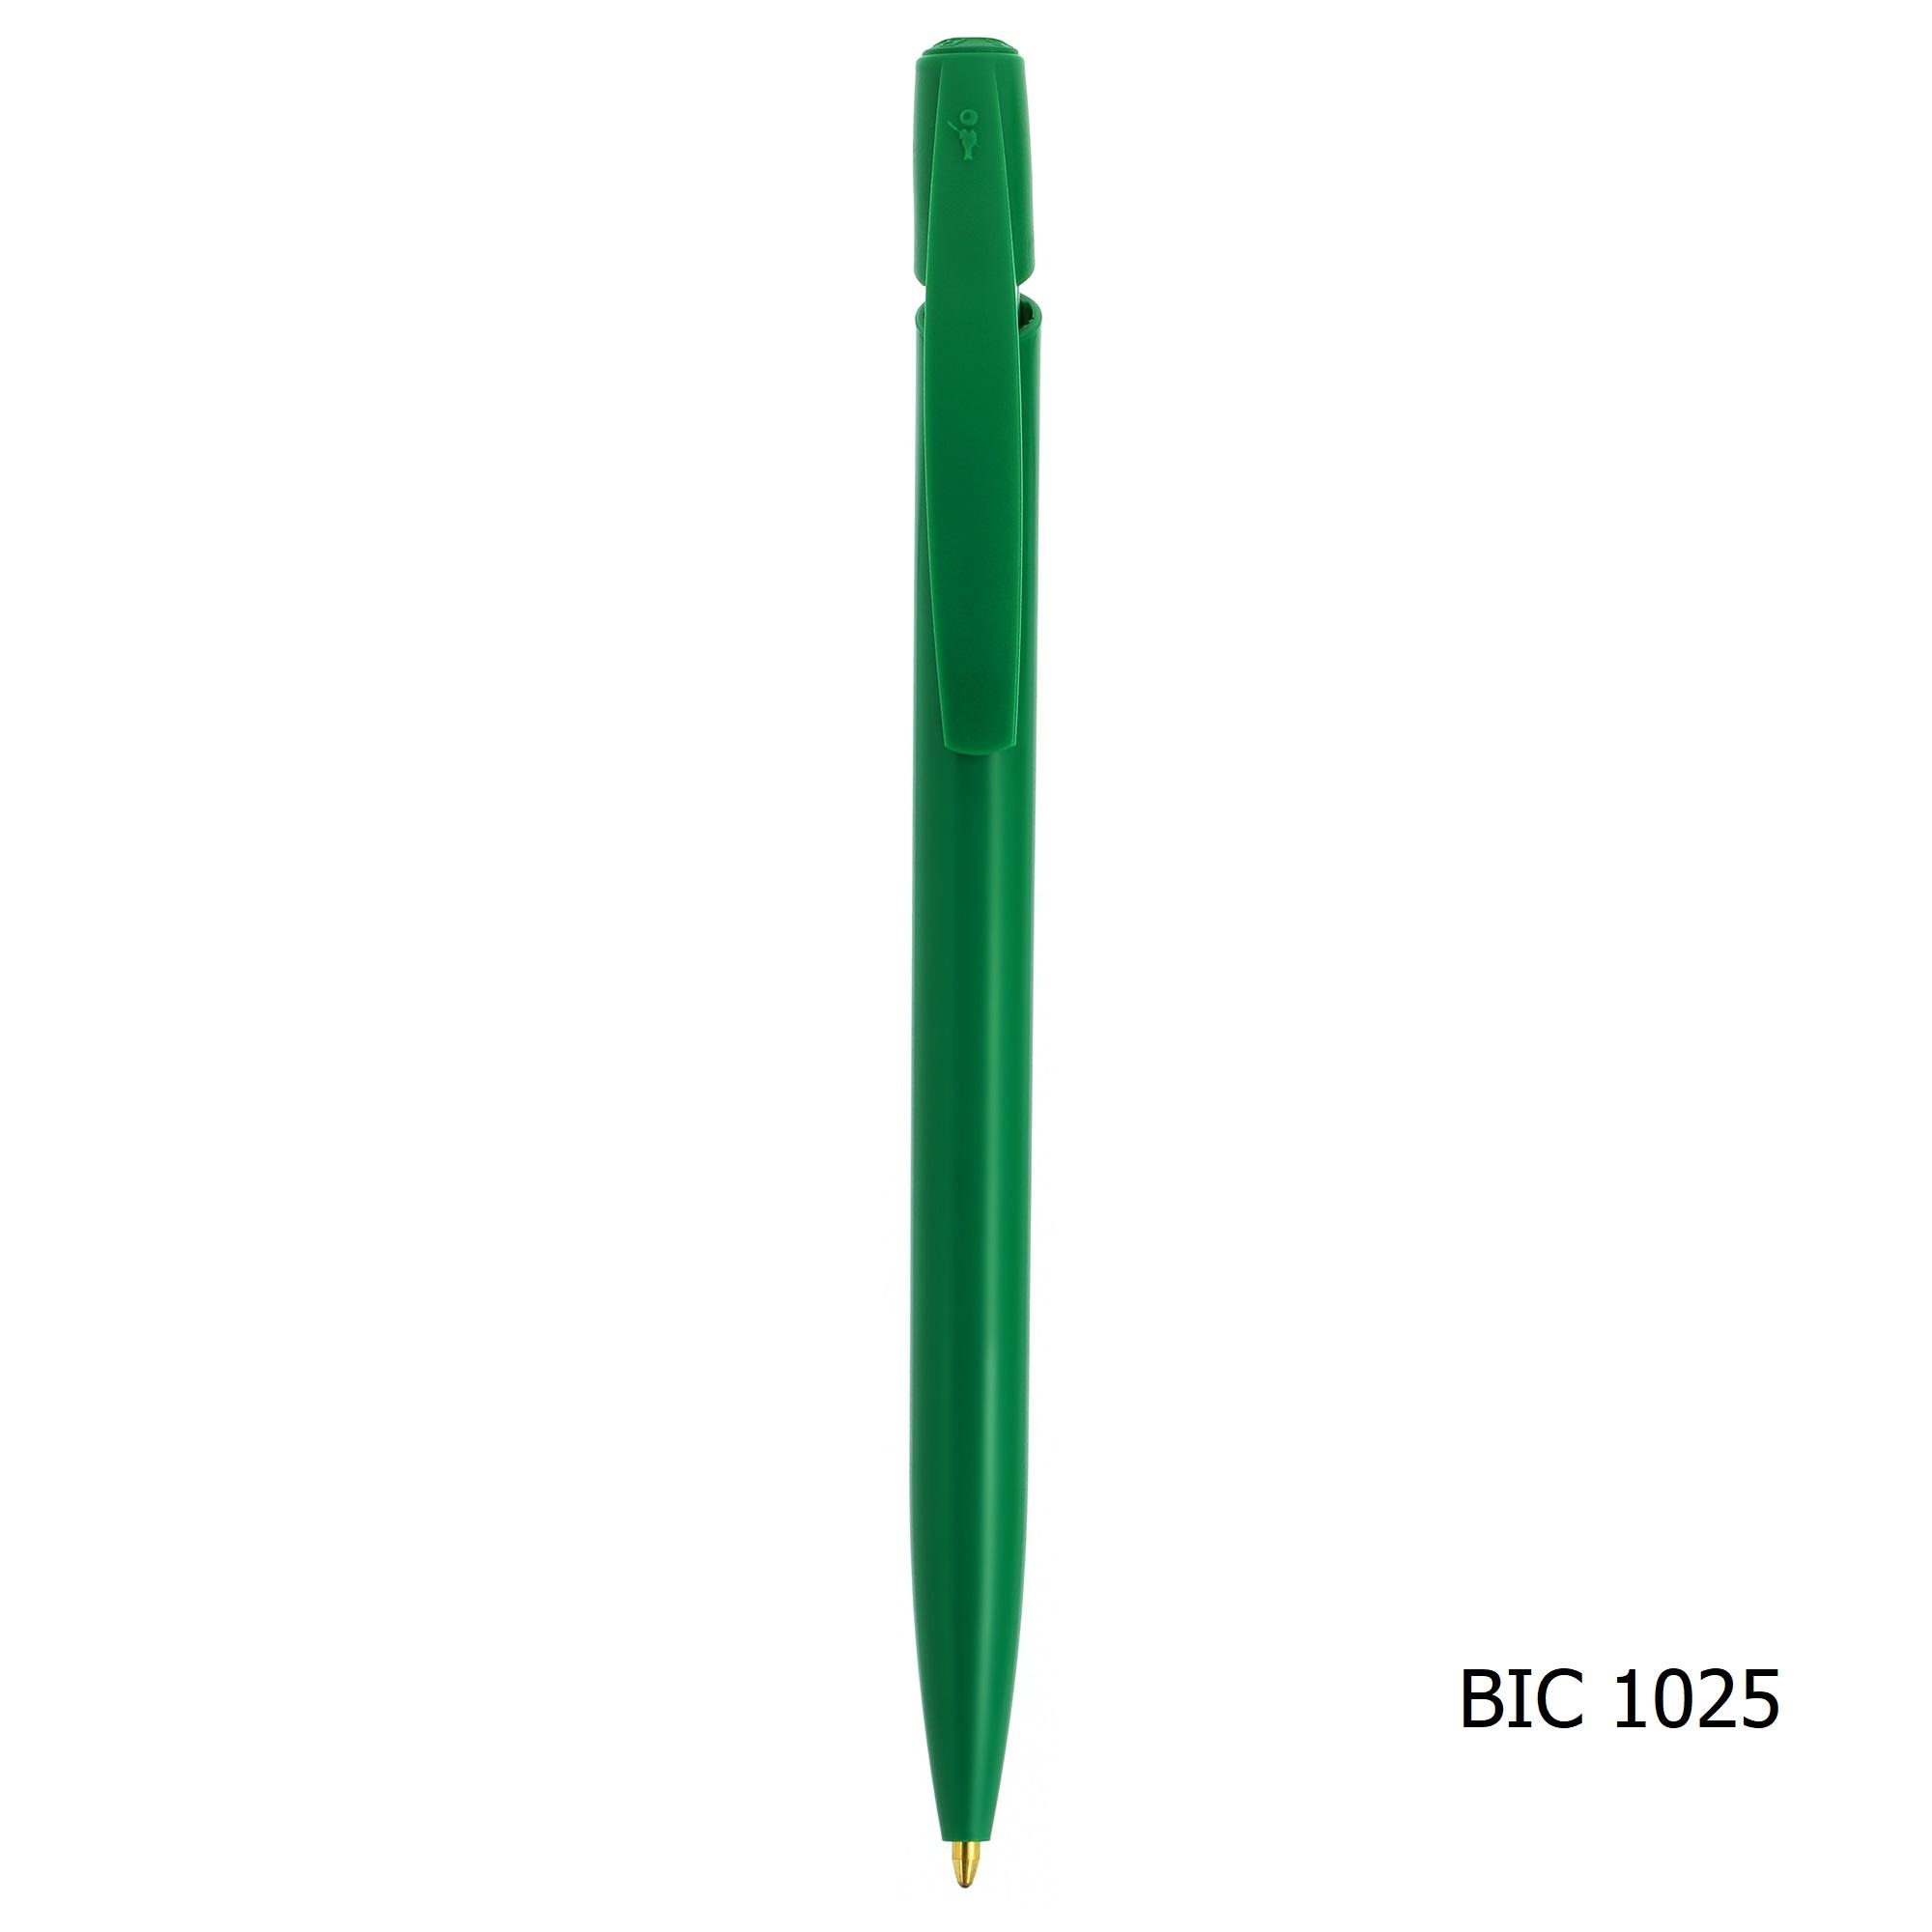 bic-pen-clic-1025-1